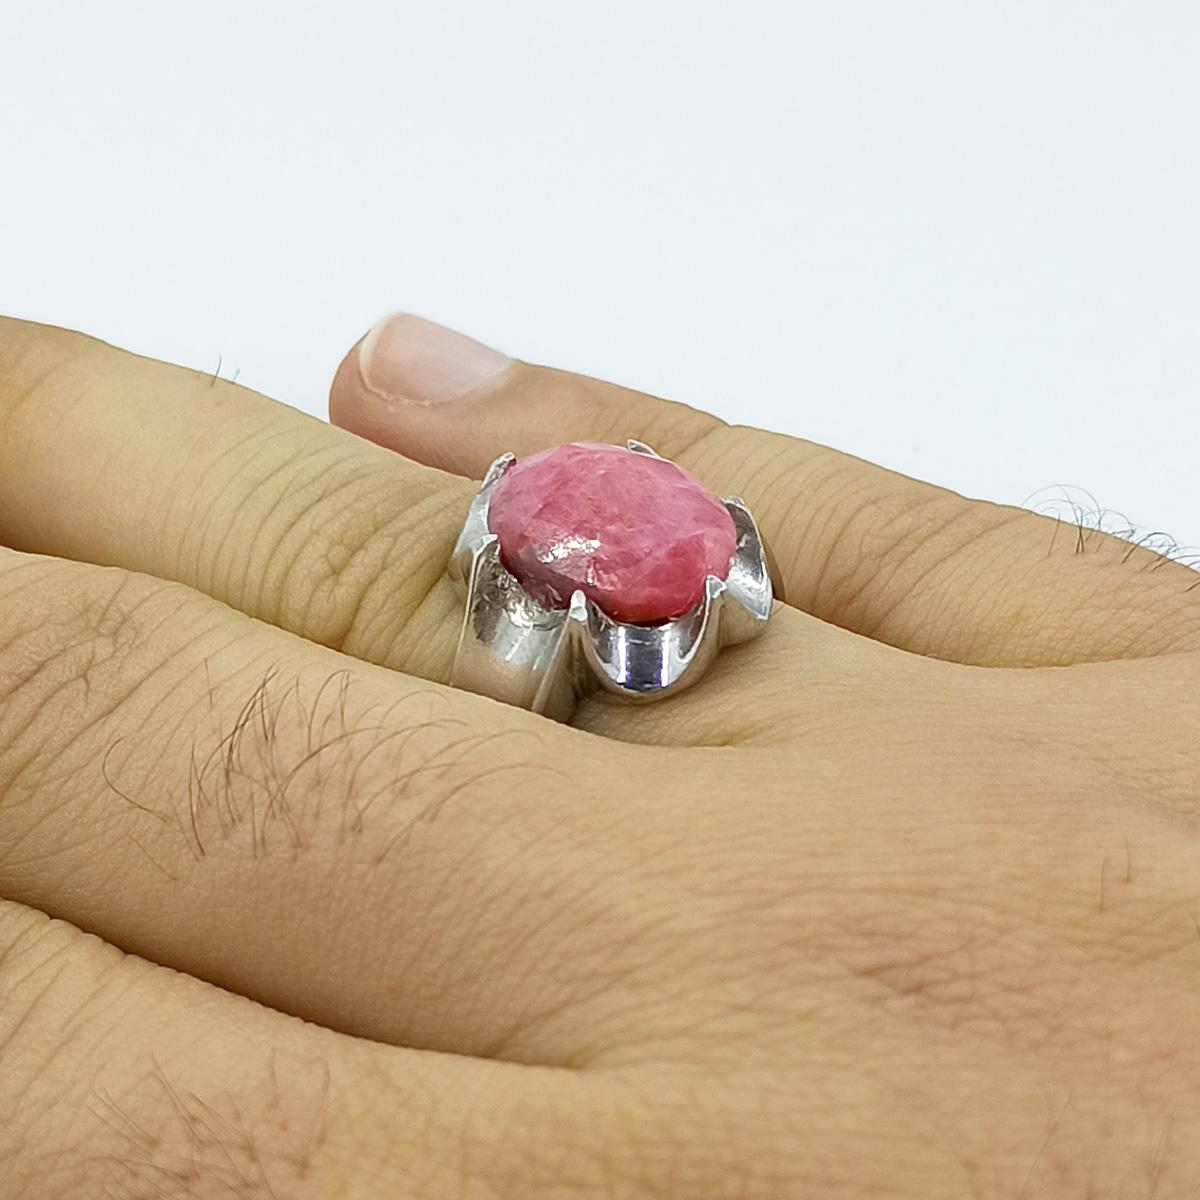 انگشتر نقره مردانه سلین کالا مدل یاقوت سرخ کد ce-As9